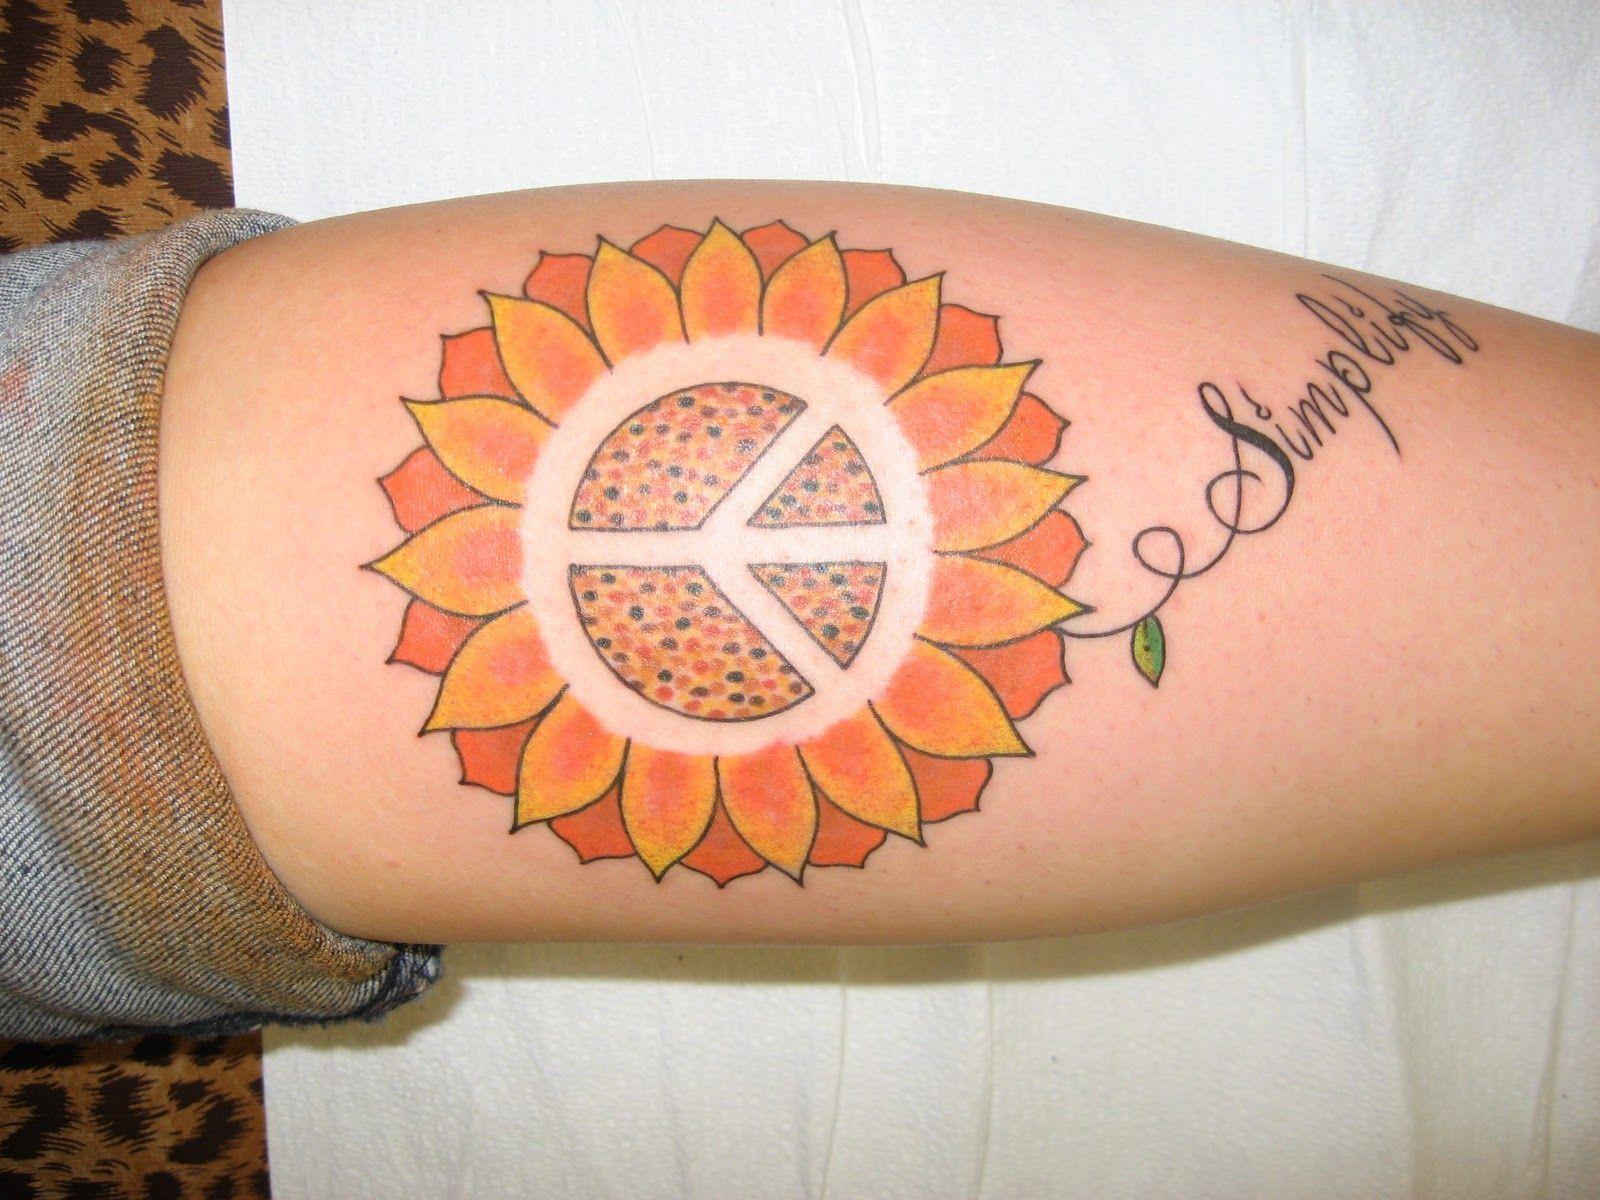 Hippie Peace Tattoos | www.imgkid.com - The Image Kid Has It!